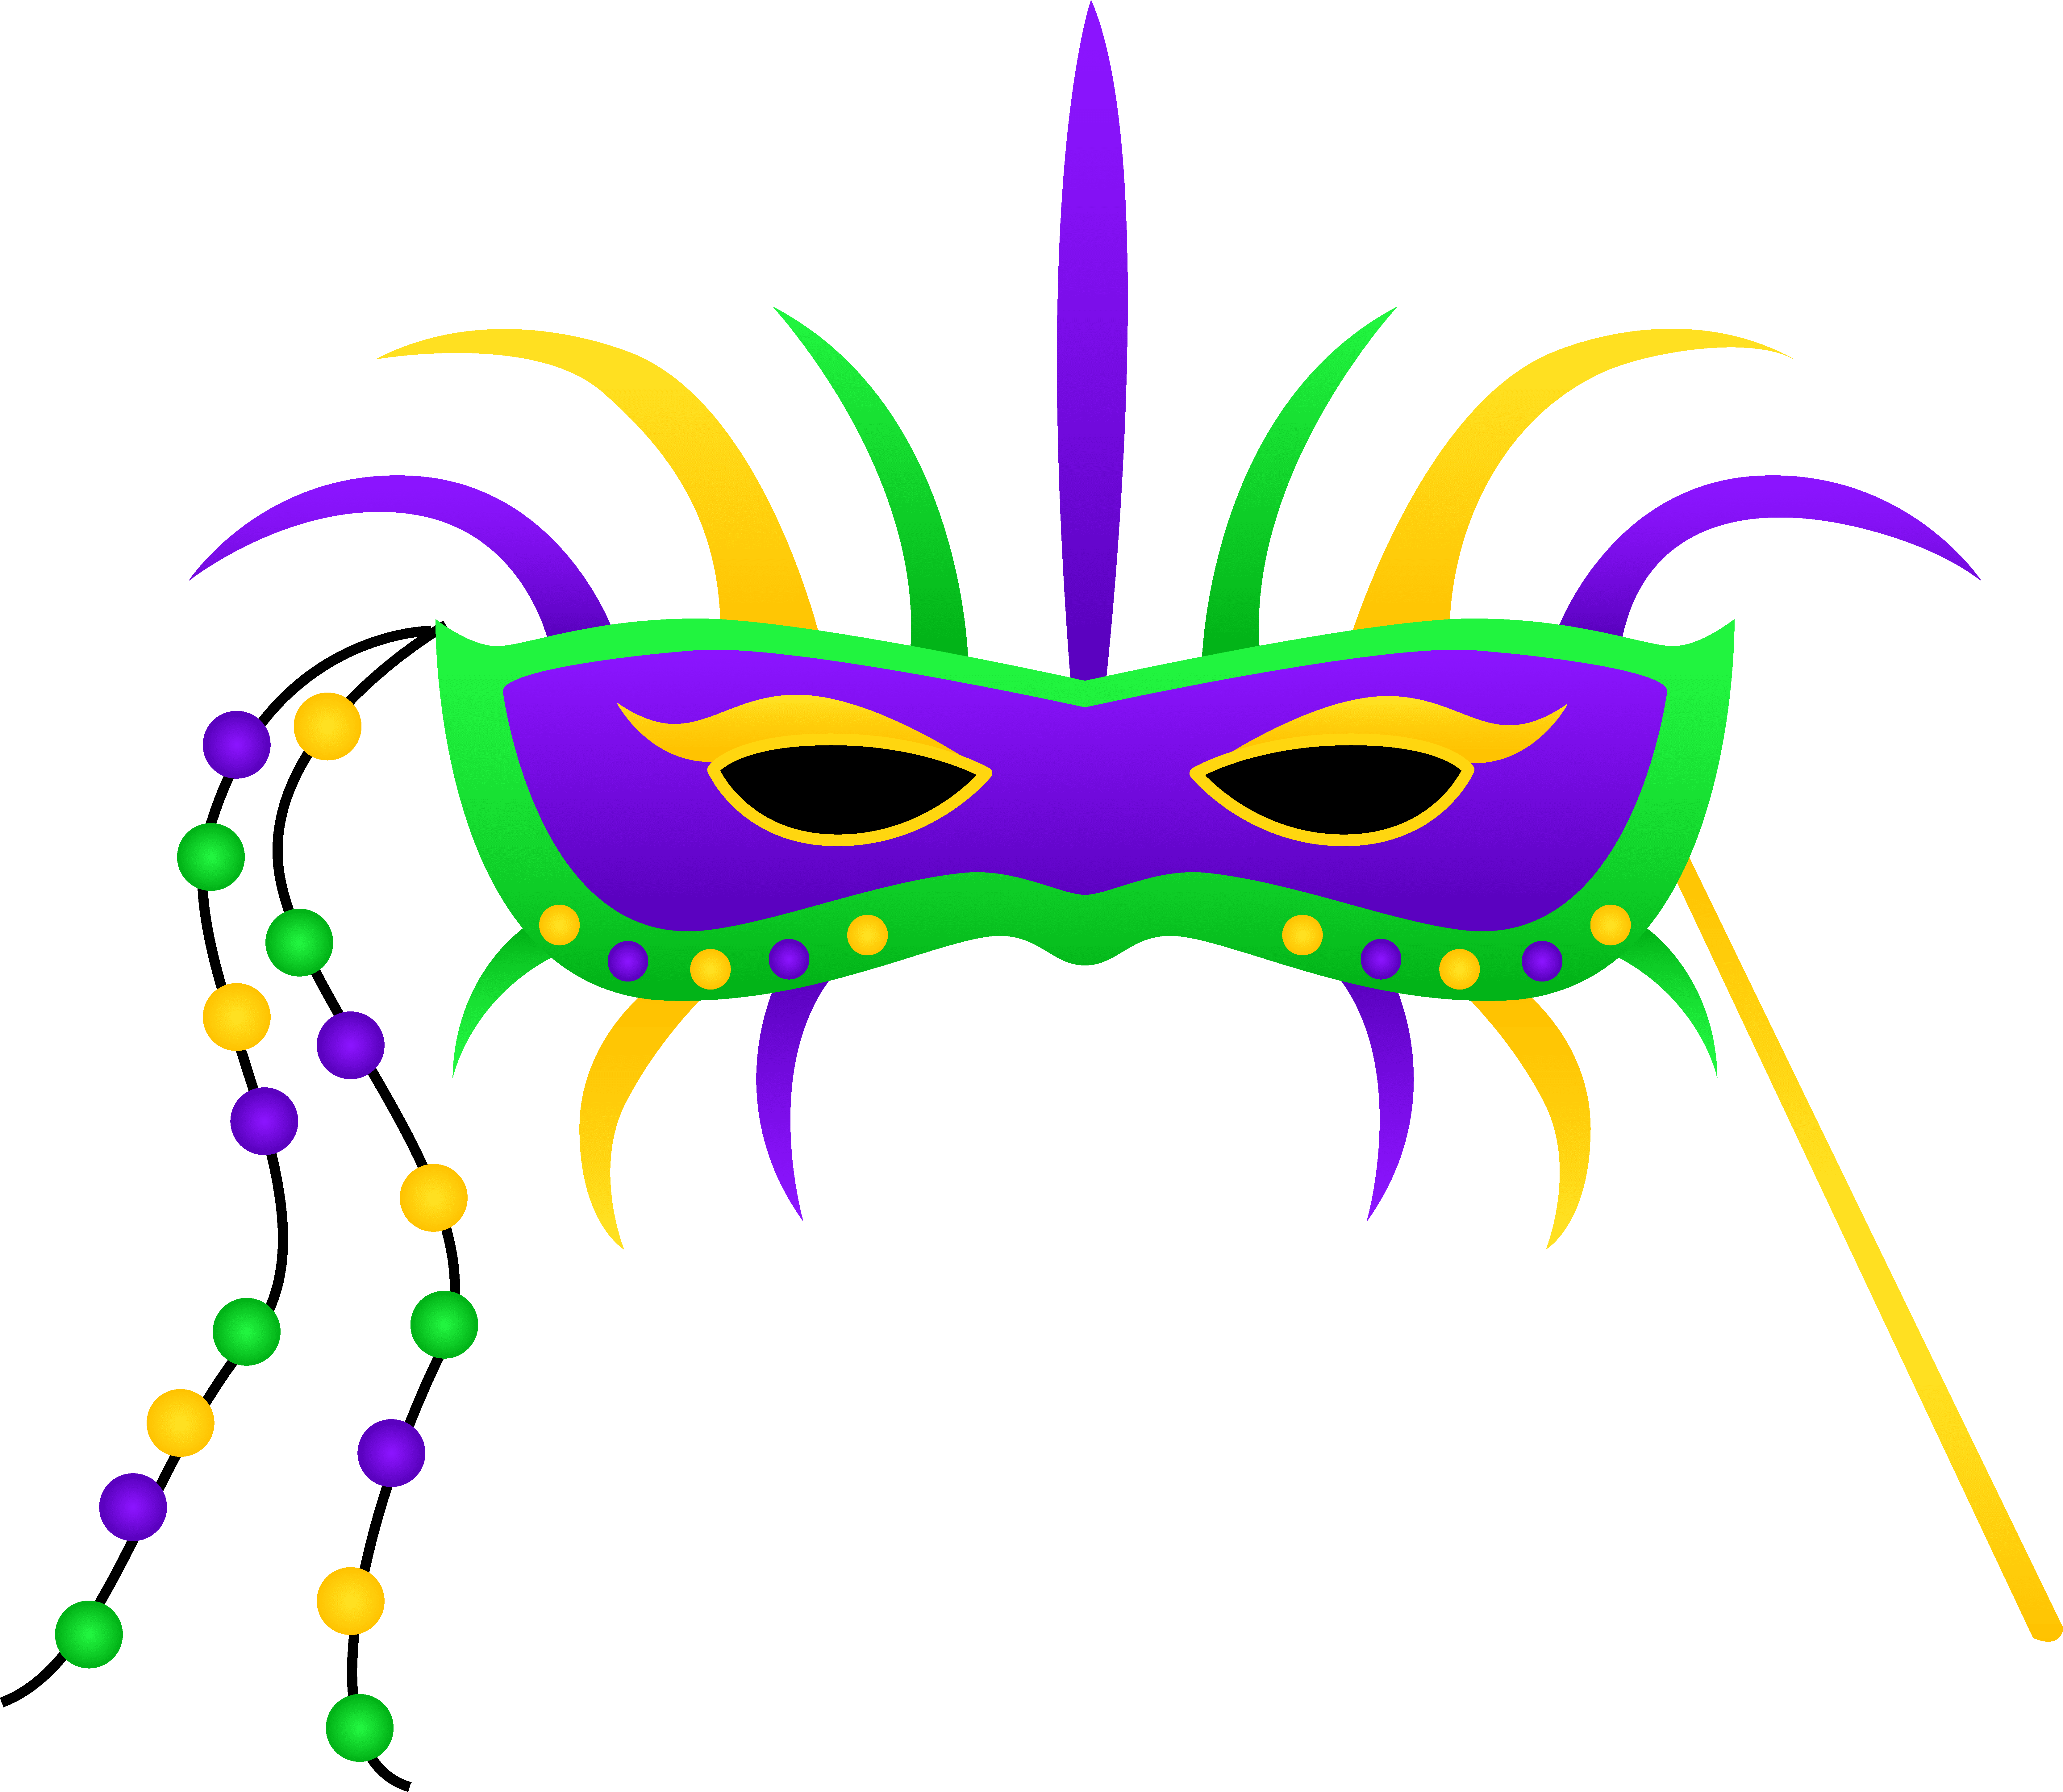 6684x5806 Smartness Mardi Gras Mask Clipart Free Clip Art To Celebrate Fat